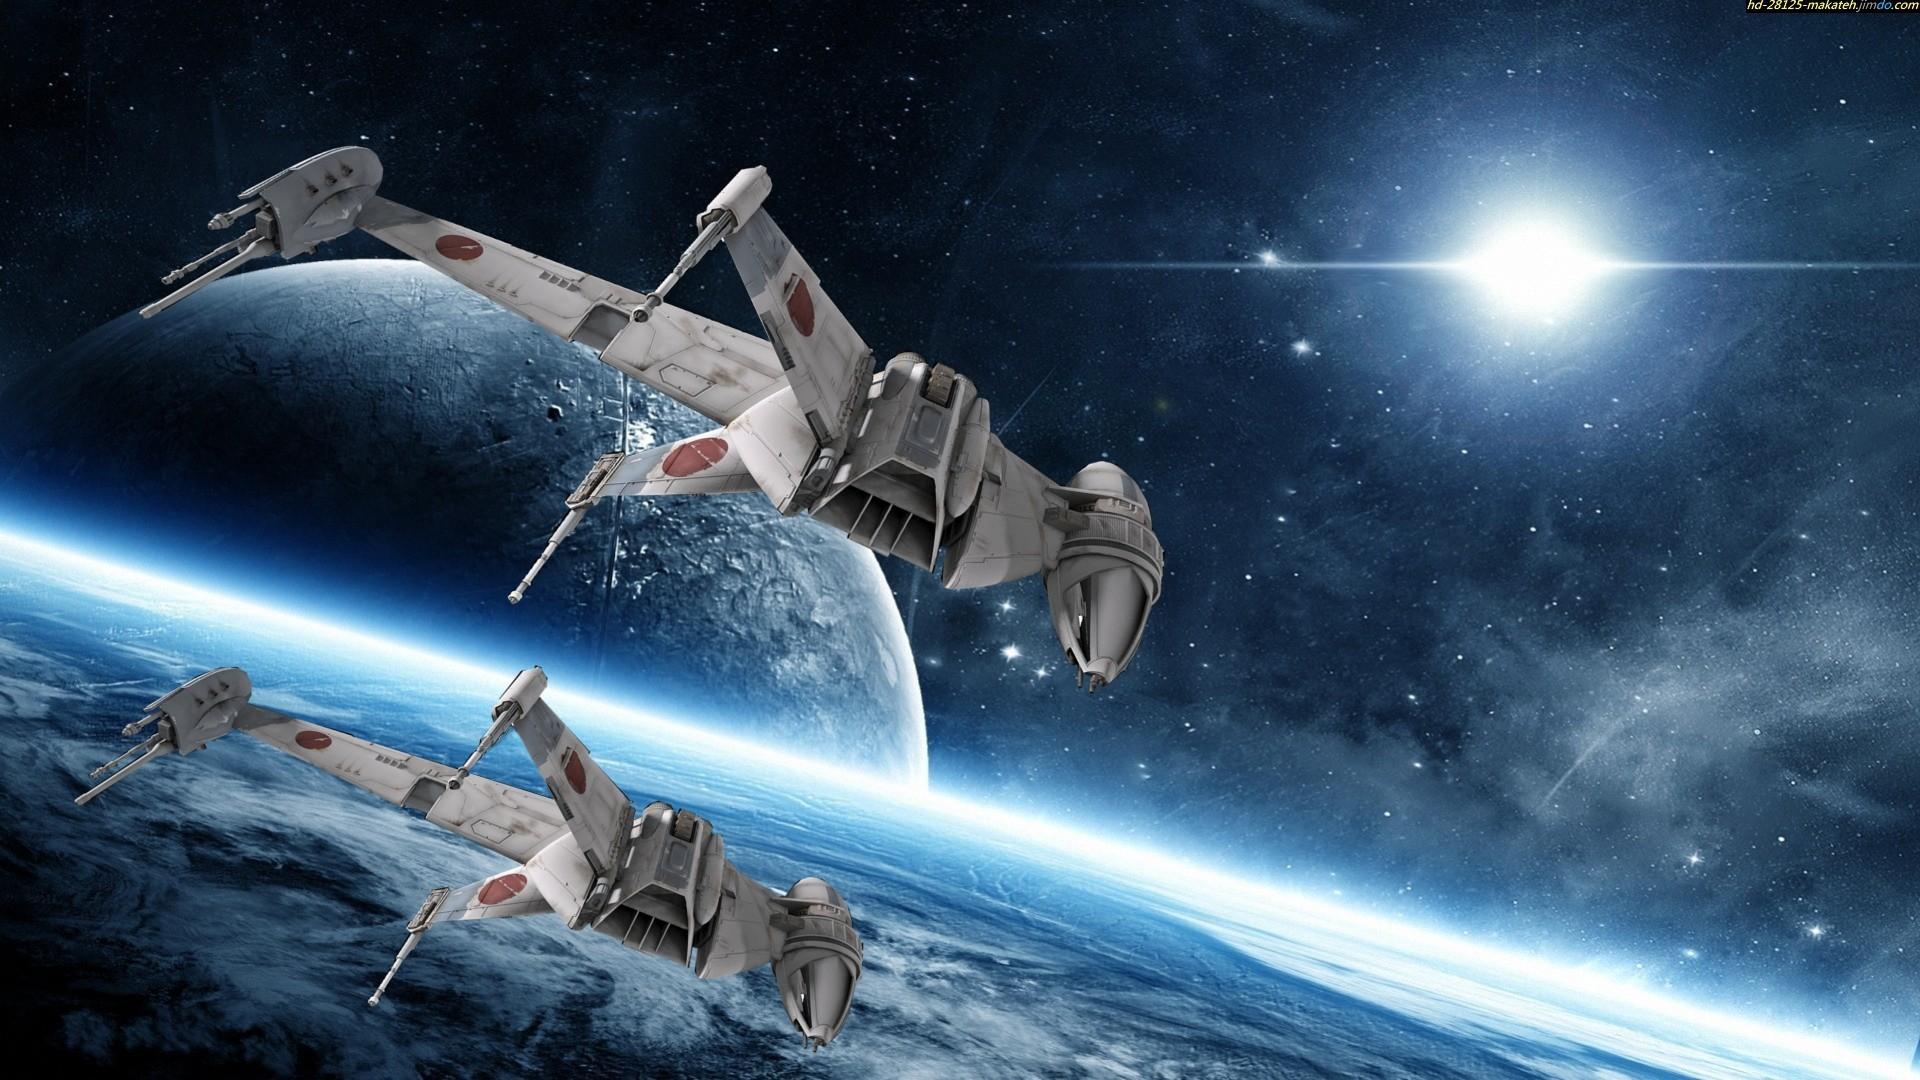 <b>Star Wars</b> Space Background – WallpaperSafari